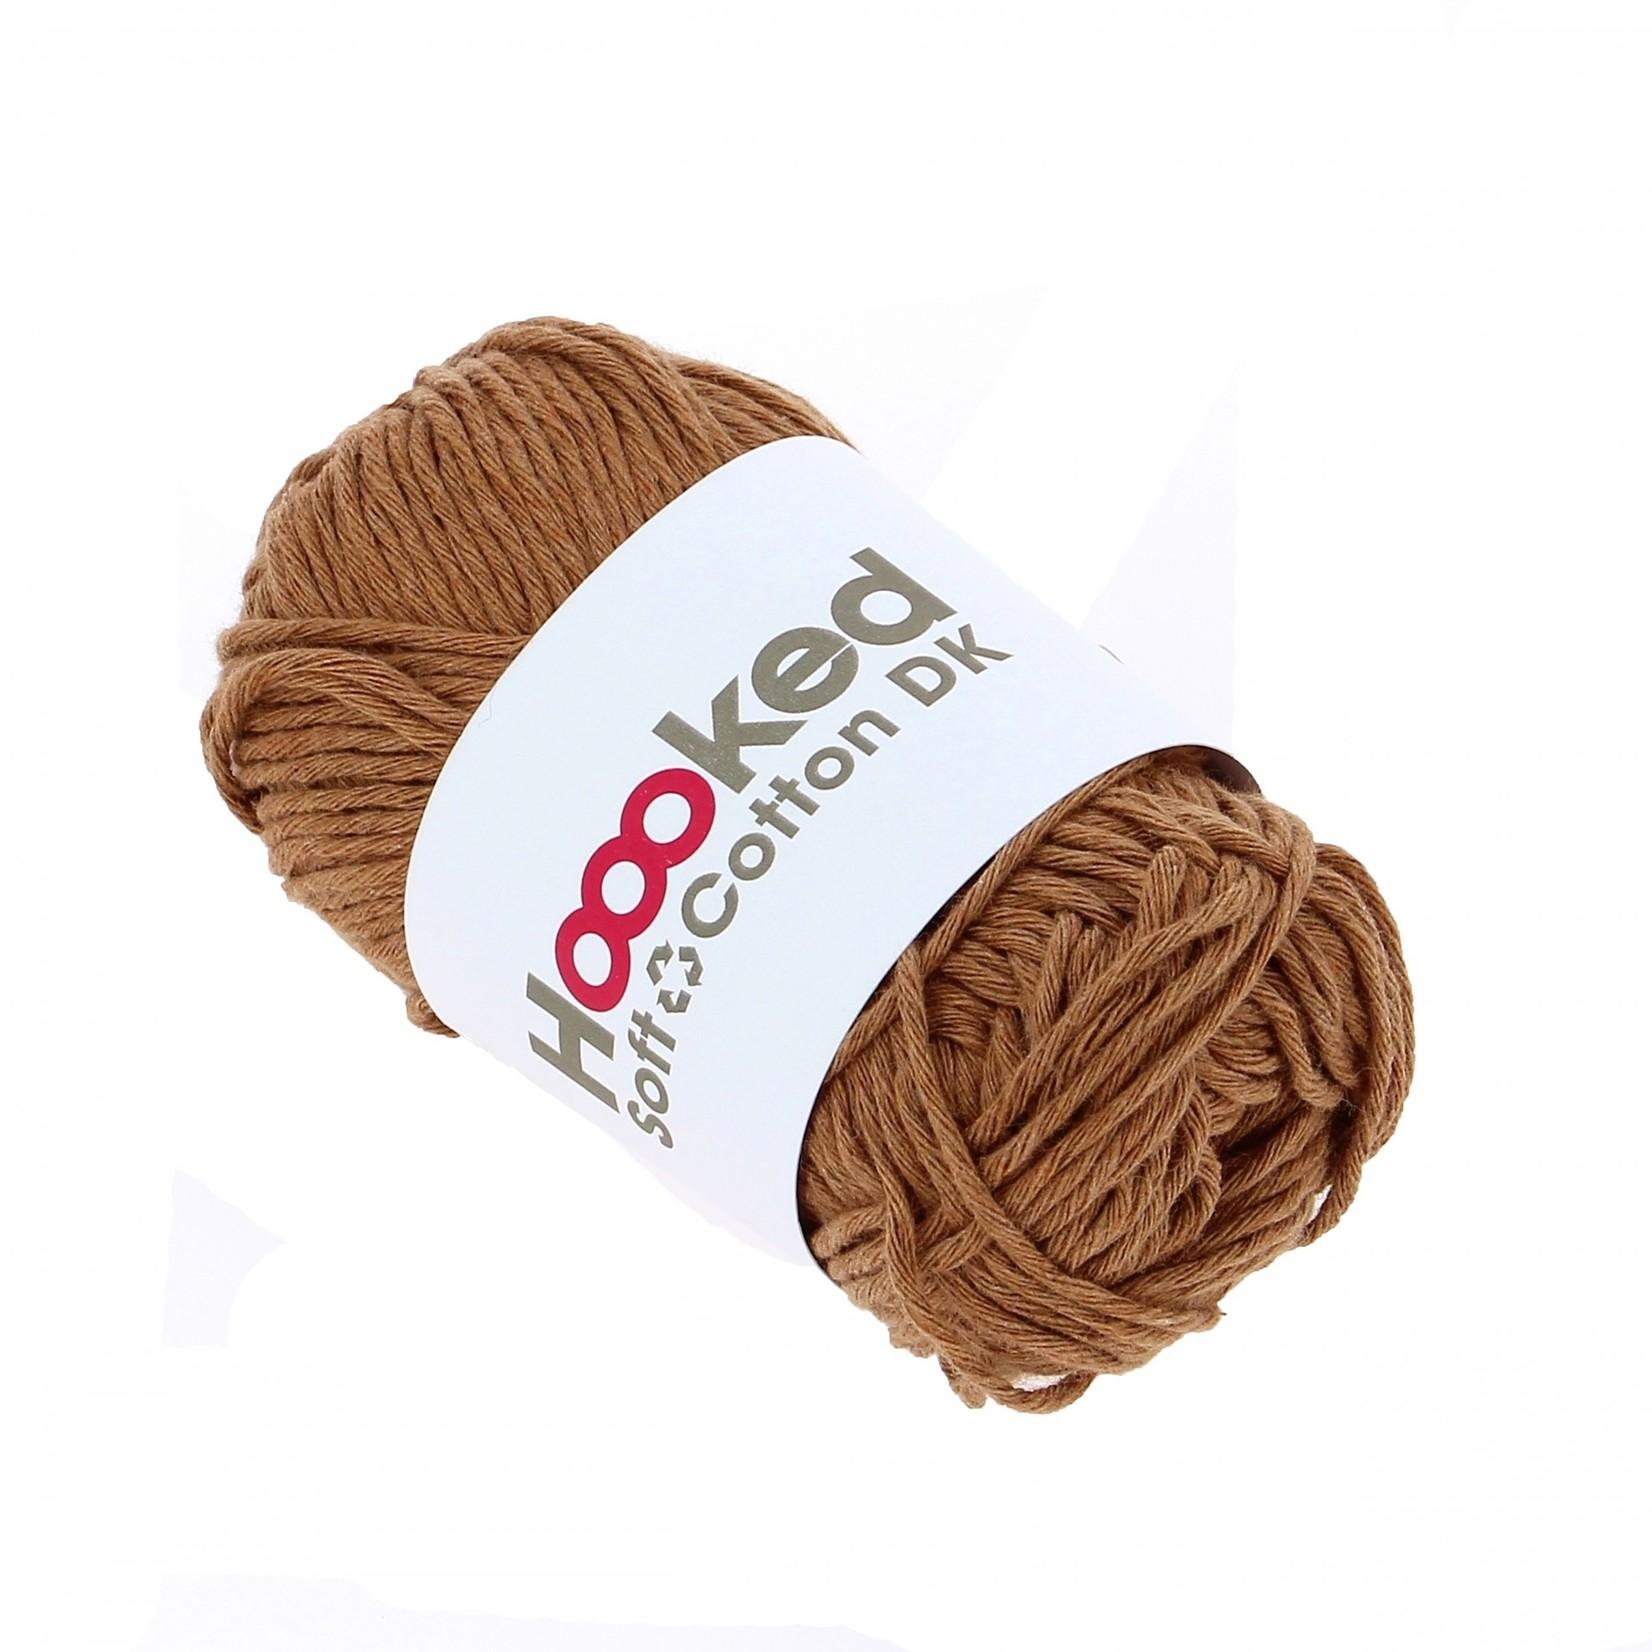 Hoooked HoookedSoft Cotton DK Caïro Caramel 50 gr. / 85 m.